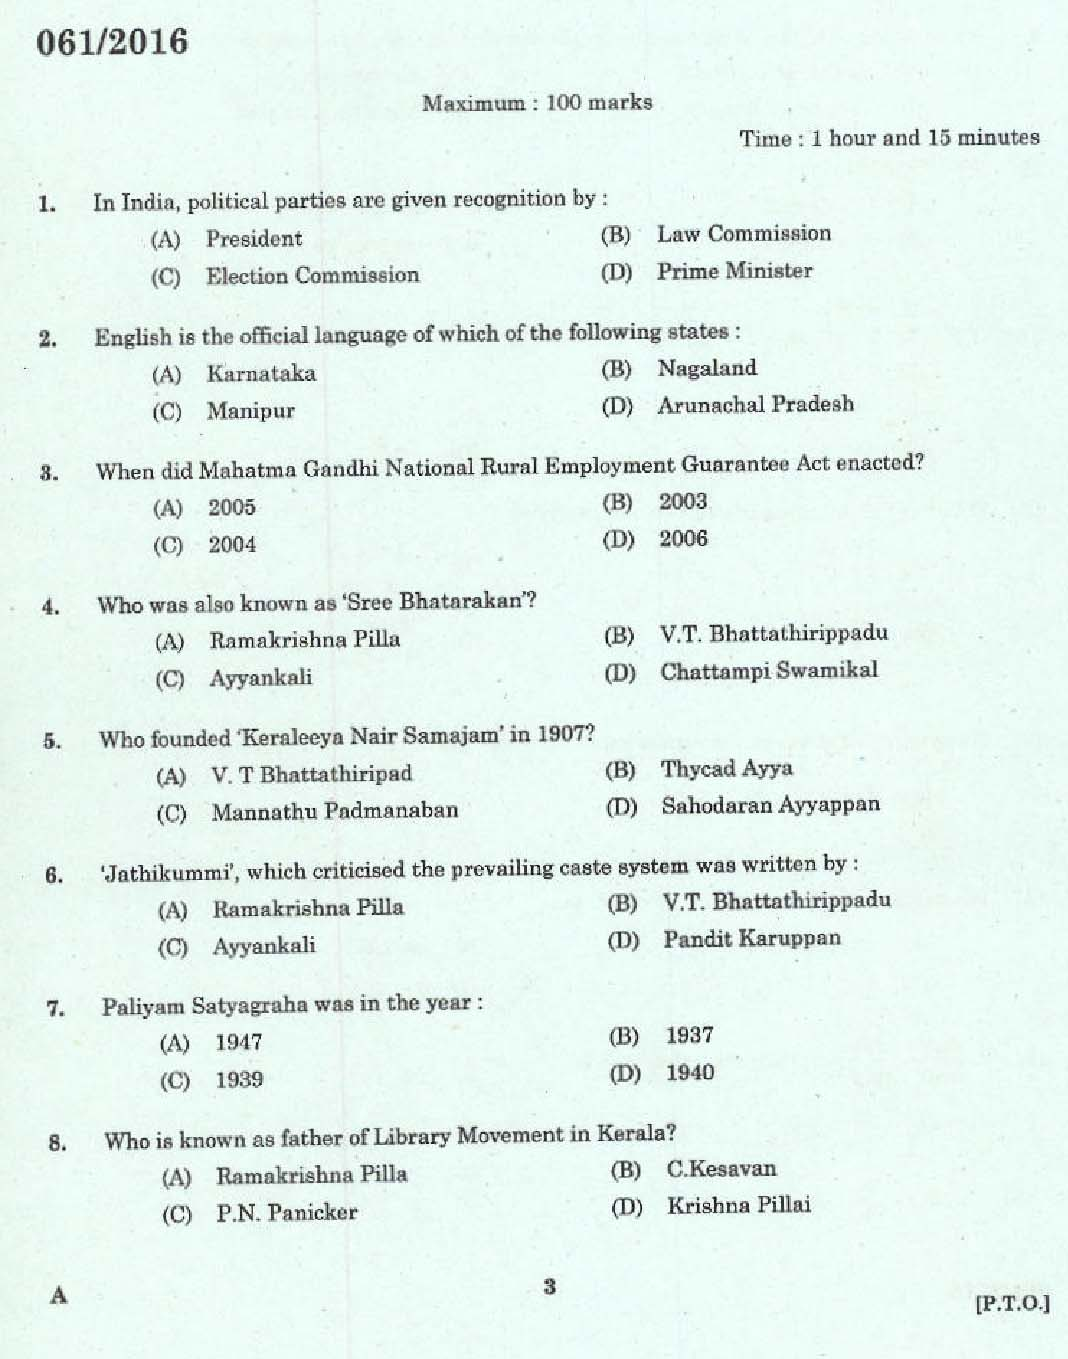 KPSC Lecturer in Automobile Engineering Exam 0612016